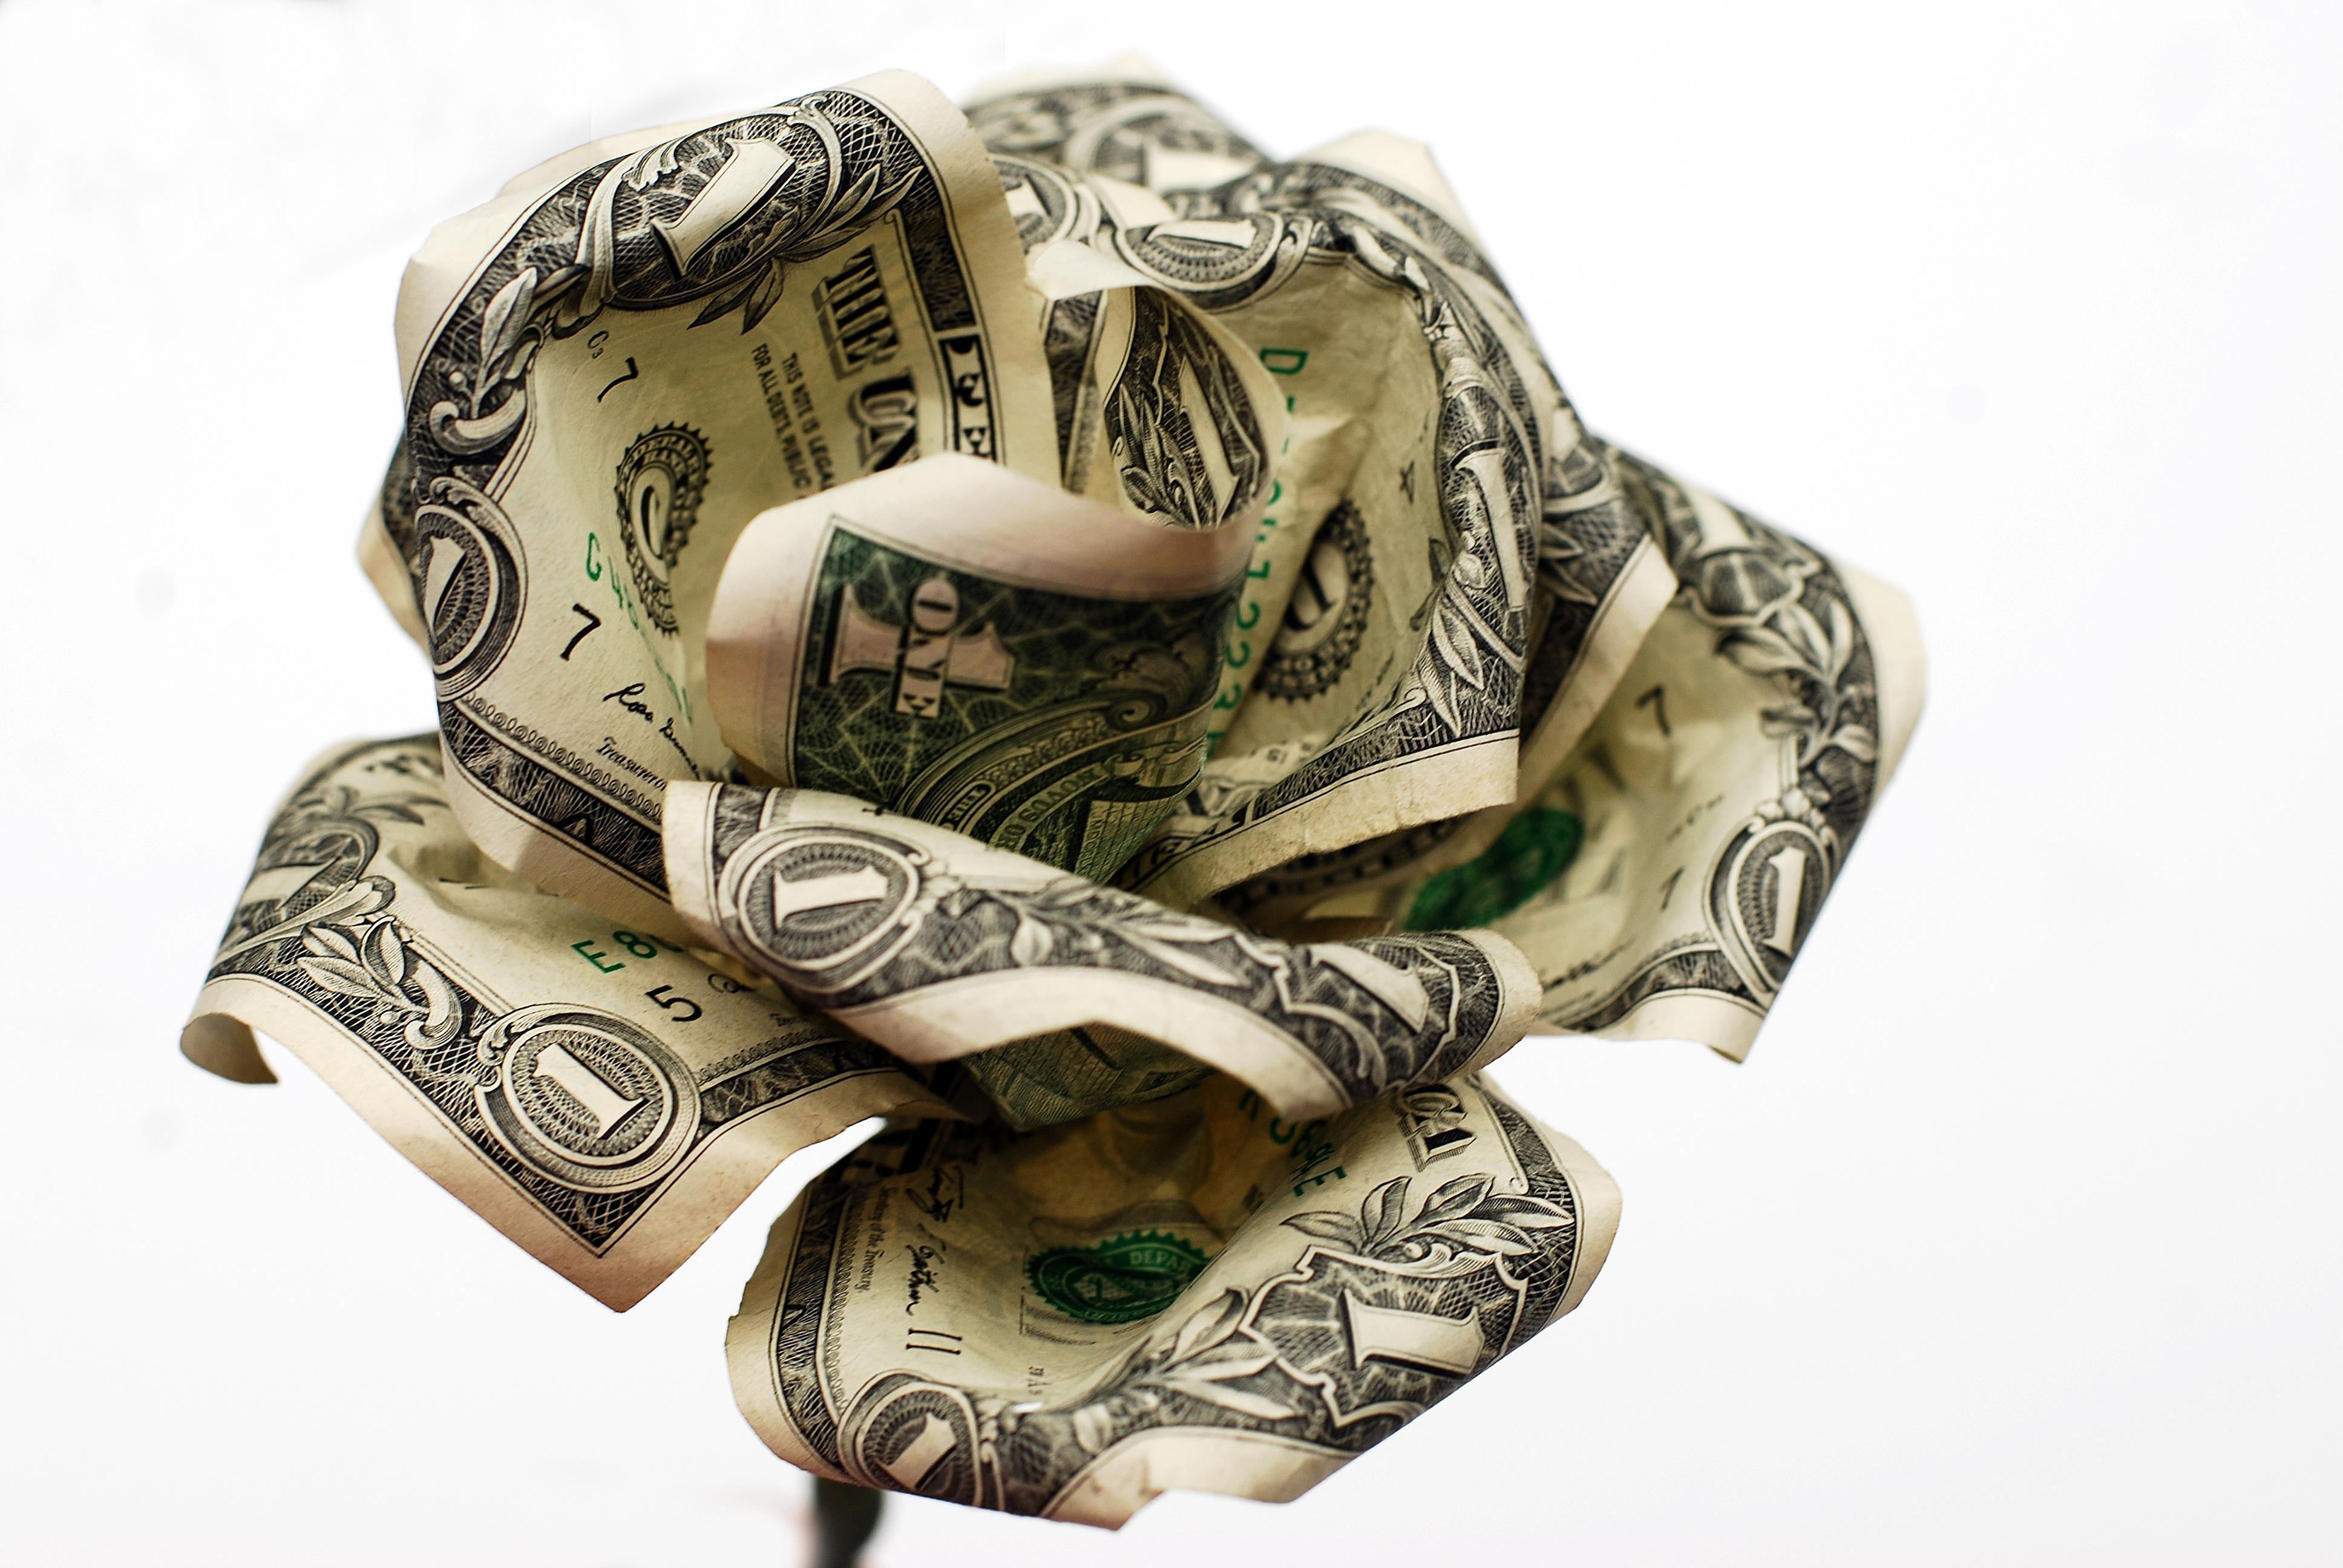 A finished money rose